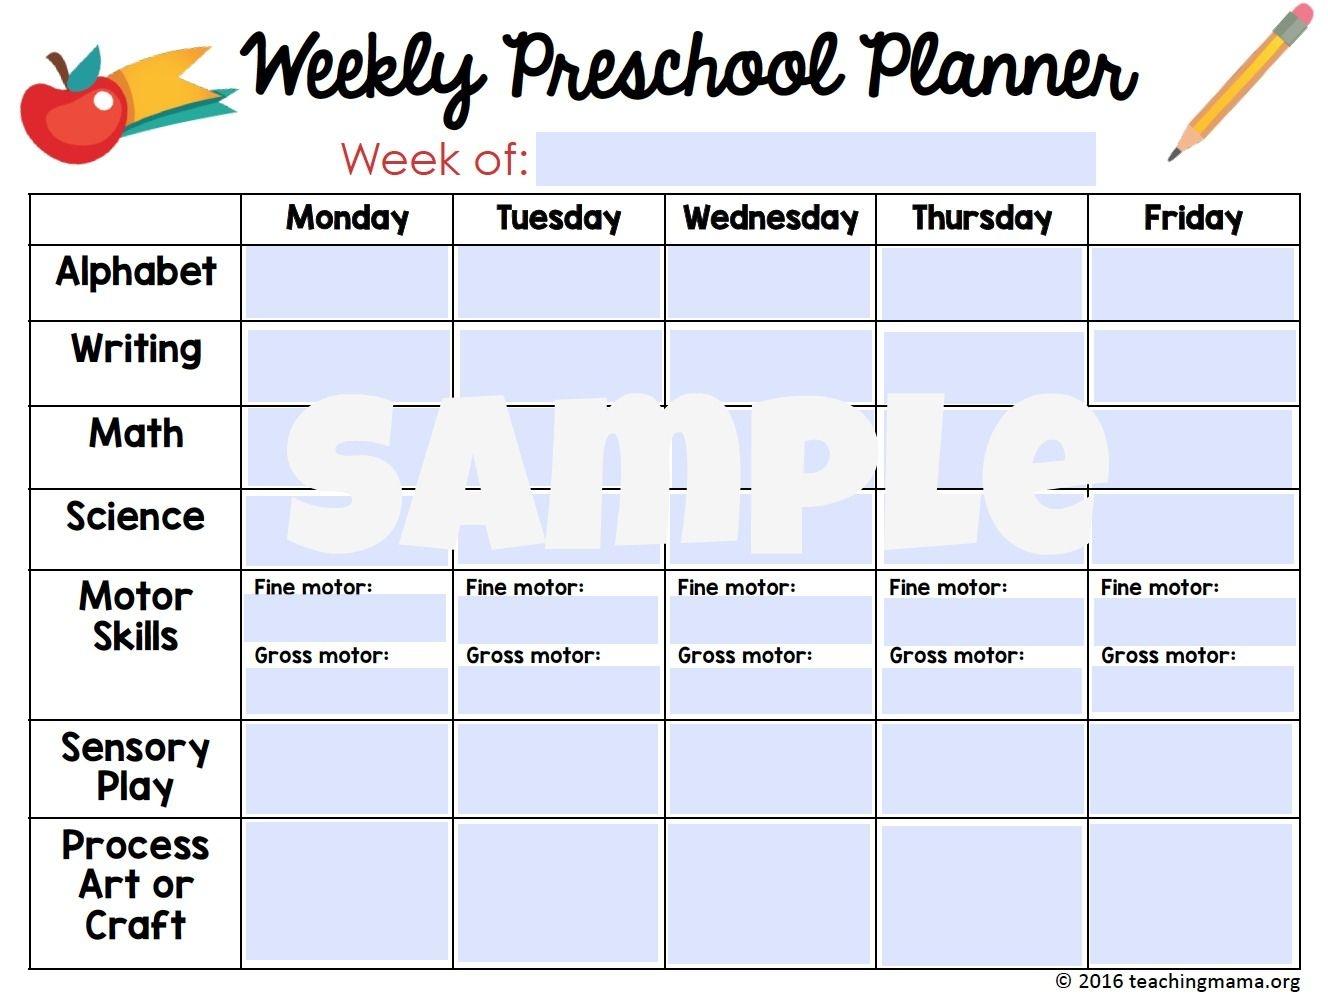 Printable Preschool Planner - On Sale Now! - Teaching Mama